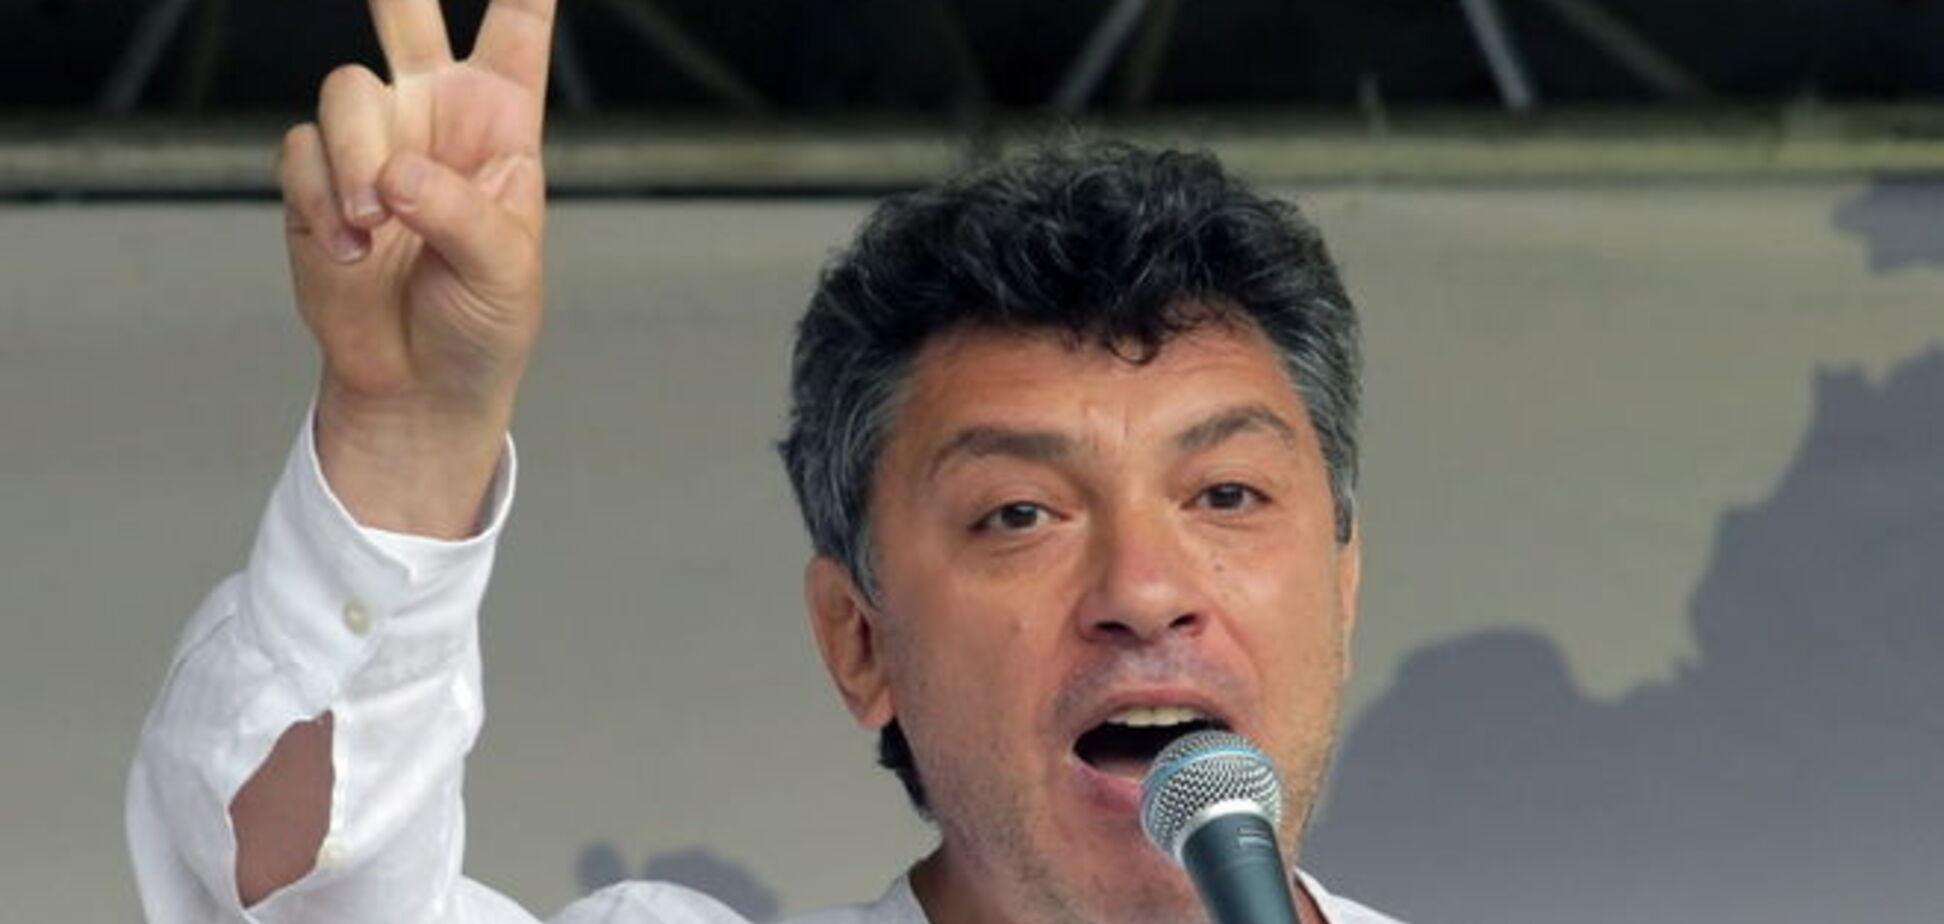 Опубликованы 10 ярких цитат Немцова об Украине